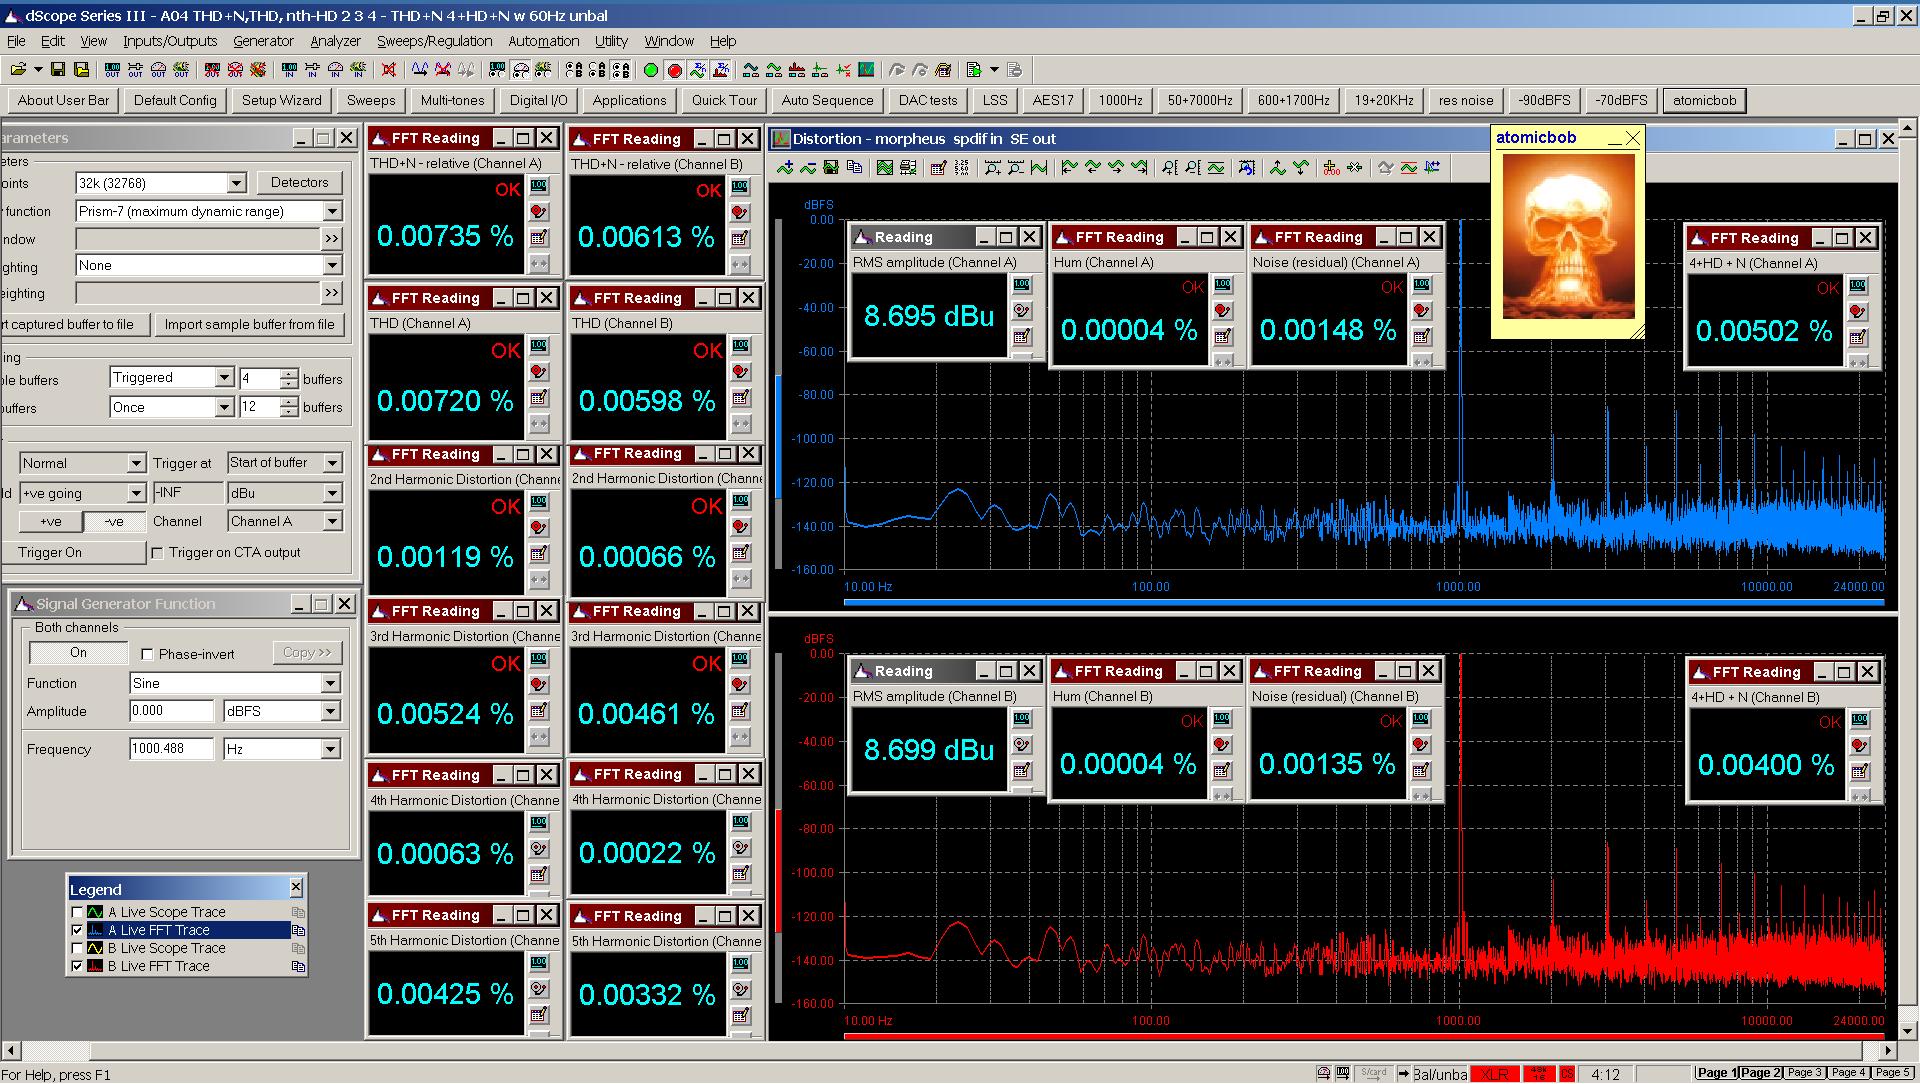 20200723 morpheus A04 THD+N THD nth-HD 4+HD+N 60Hz FFT SE 0dBFS - spdif - dBFS scale.png